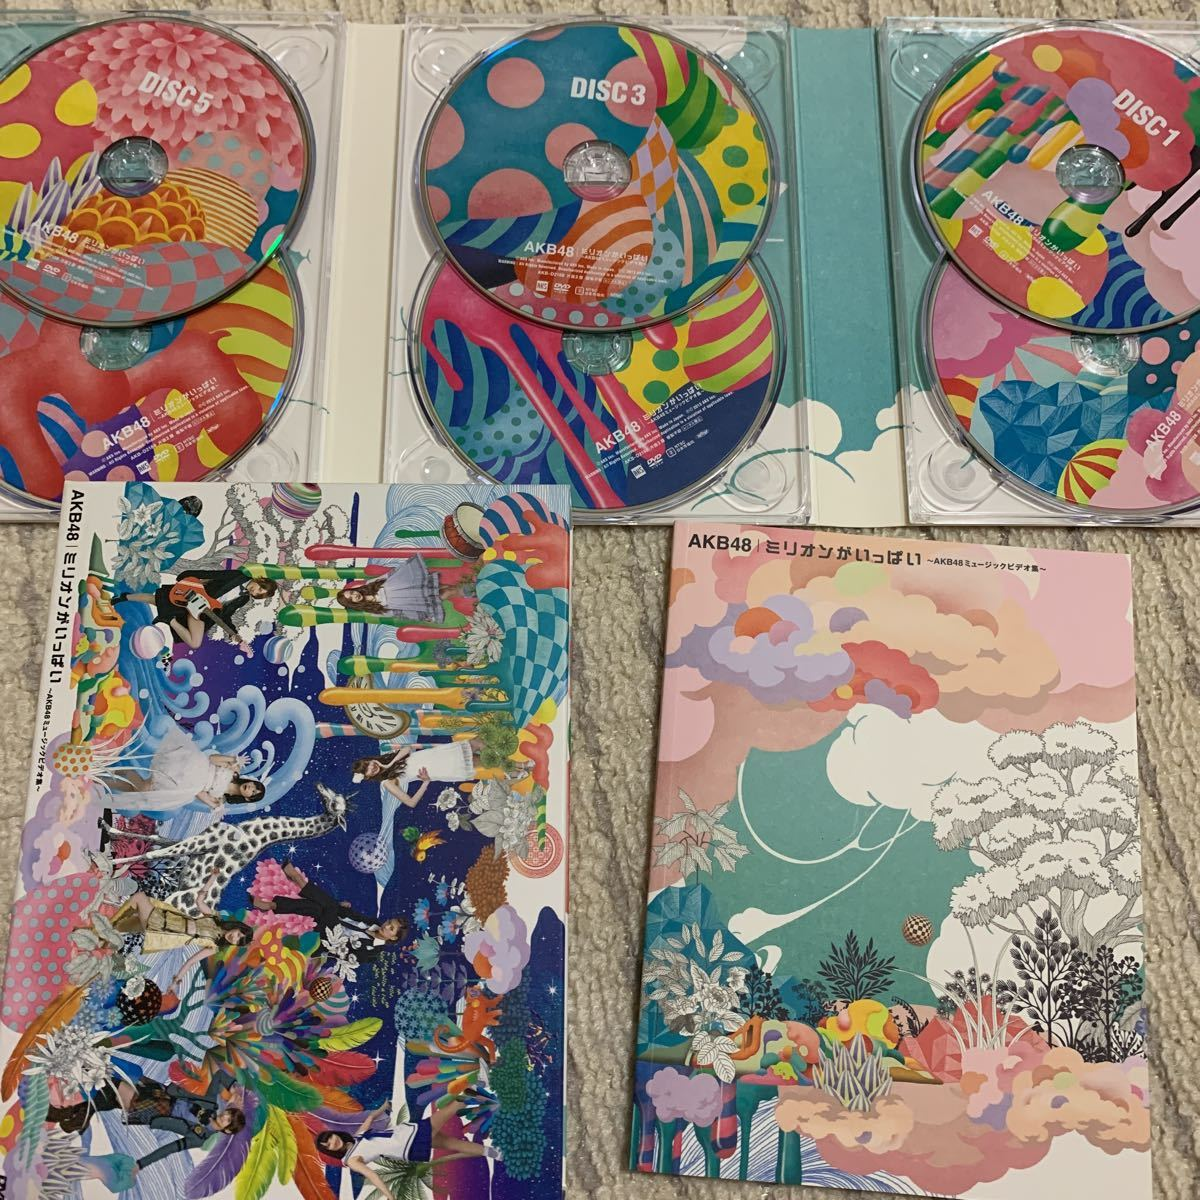 AKB48 DVD ミリオンがいっぱい~ AKB48ミュージックビデオ集 スペシャルBOX 6枚組 AKB48定価: ¥ 11,931 激安 格安 限定 です_画像2